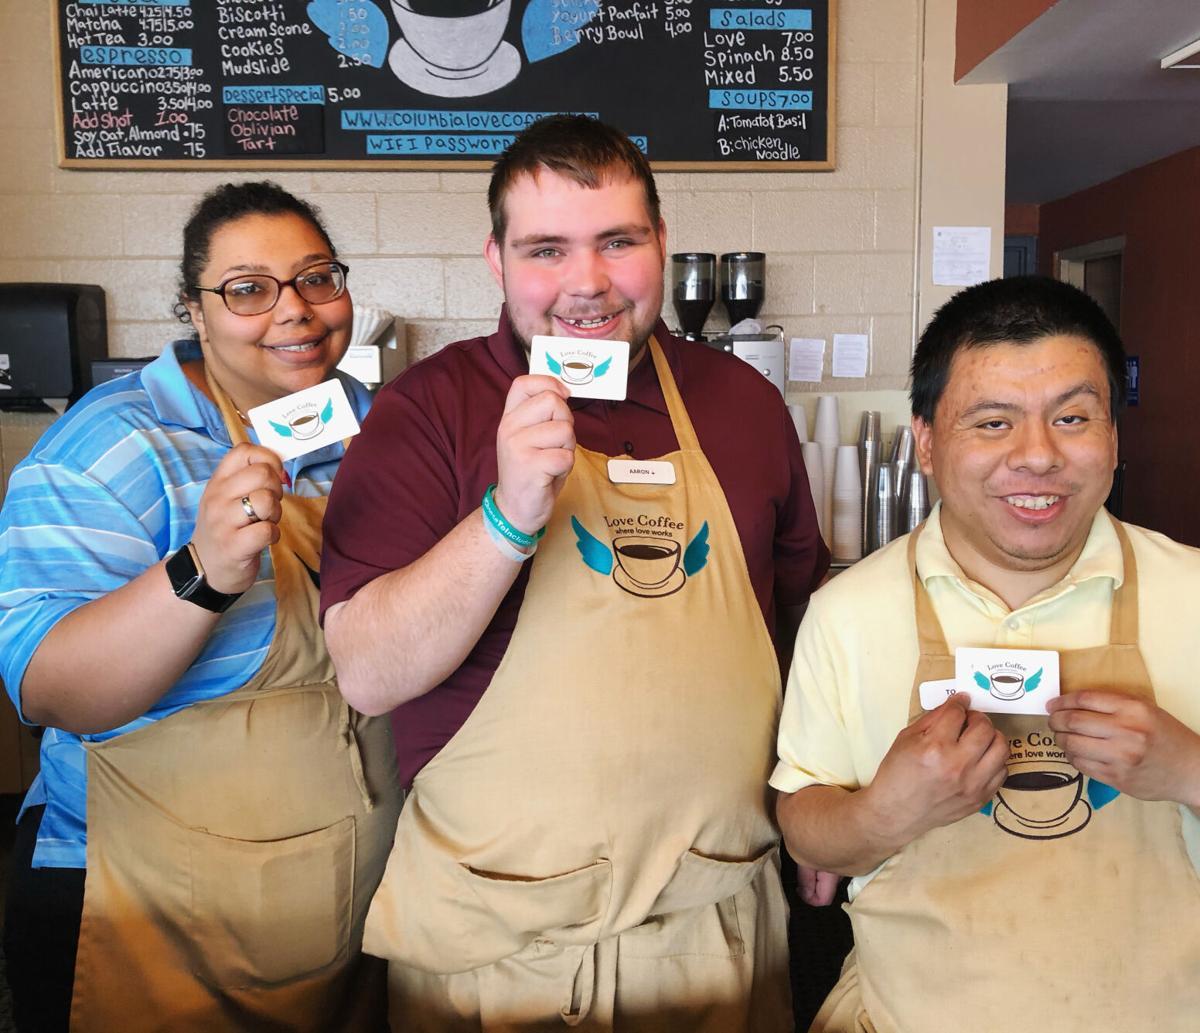 Love Coffee employees